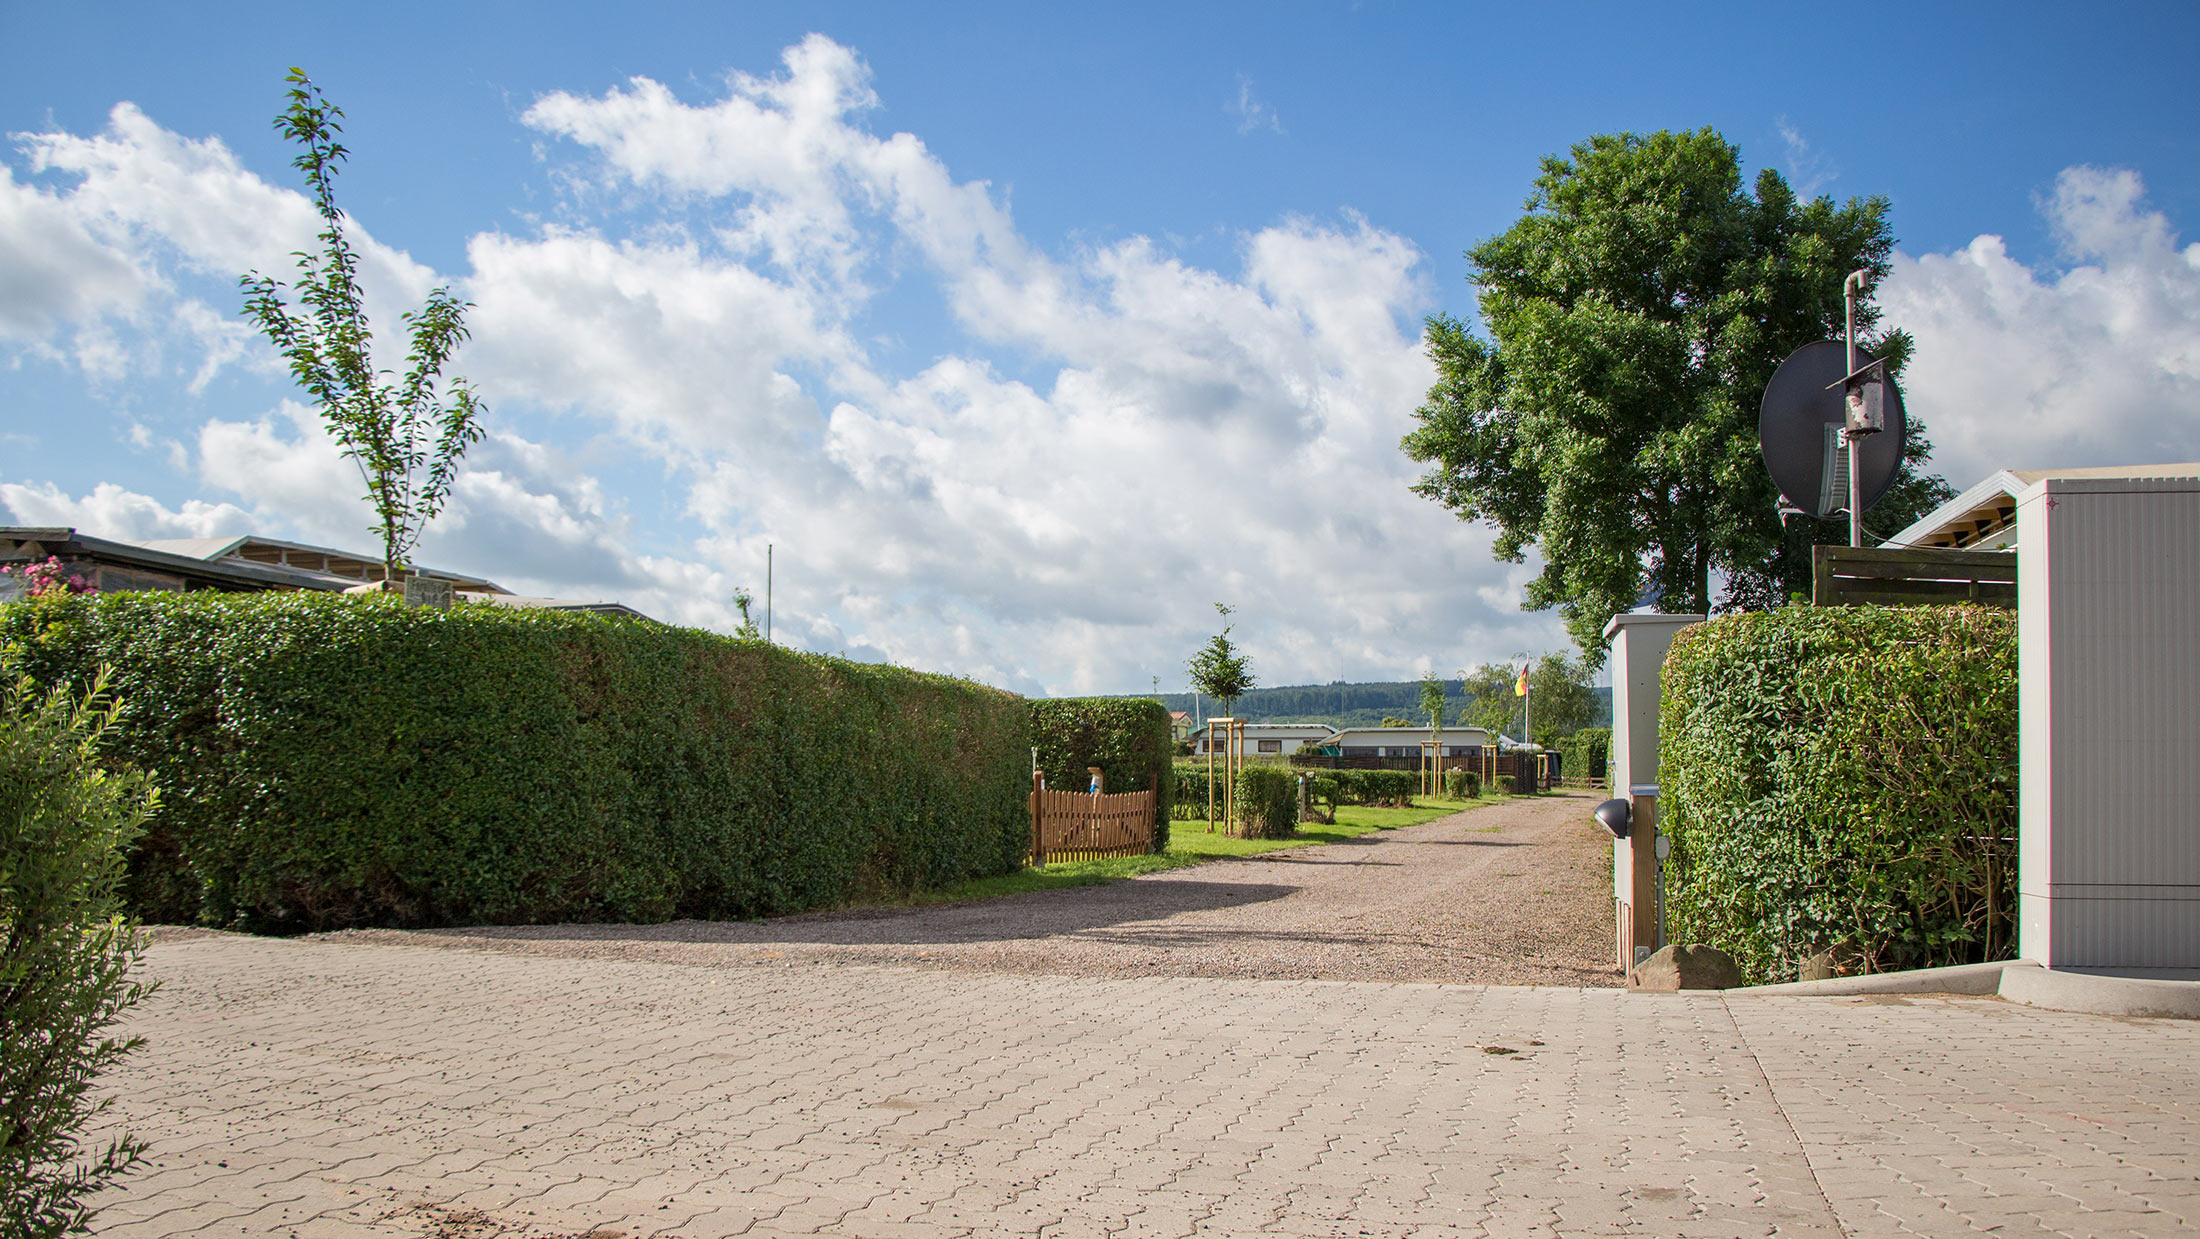 campingplatz_weser_grohnde_emmerthal-weserplaetze